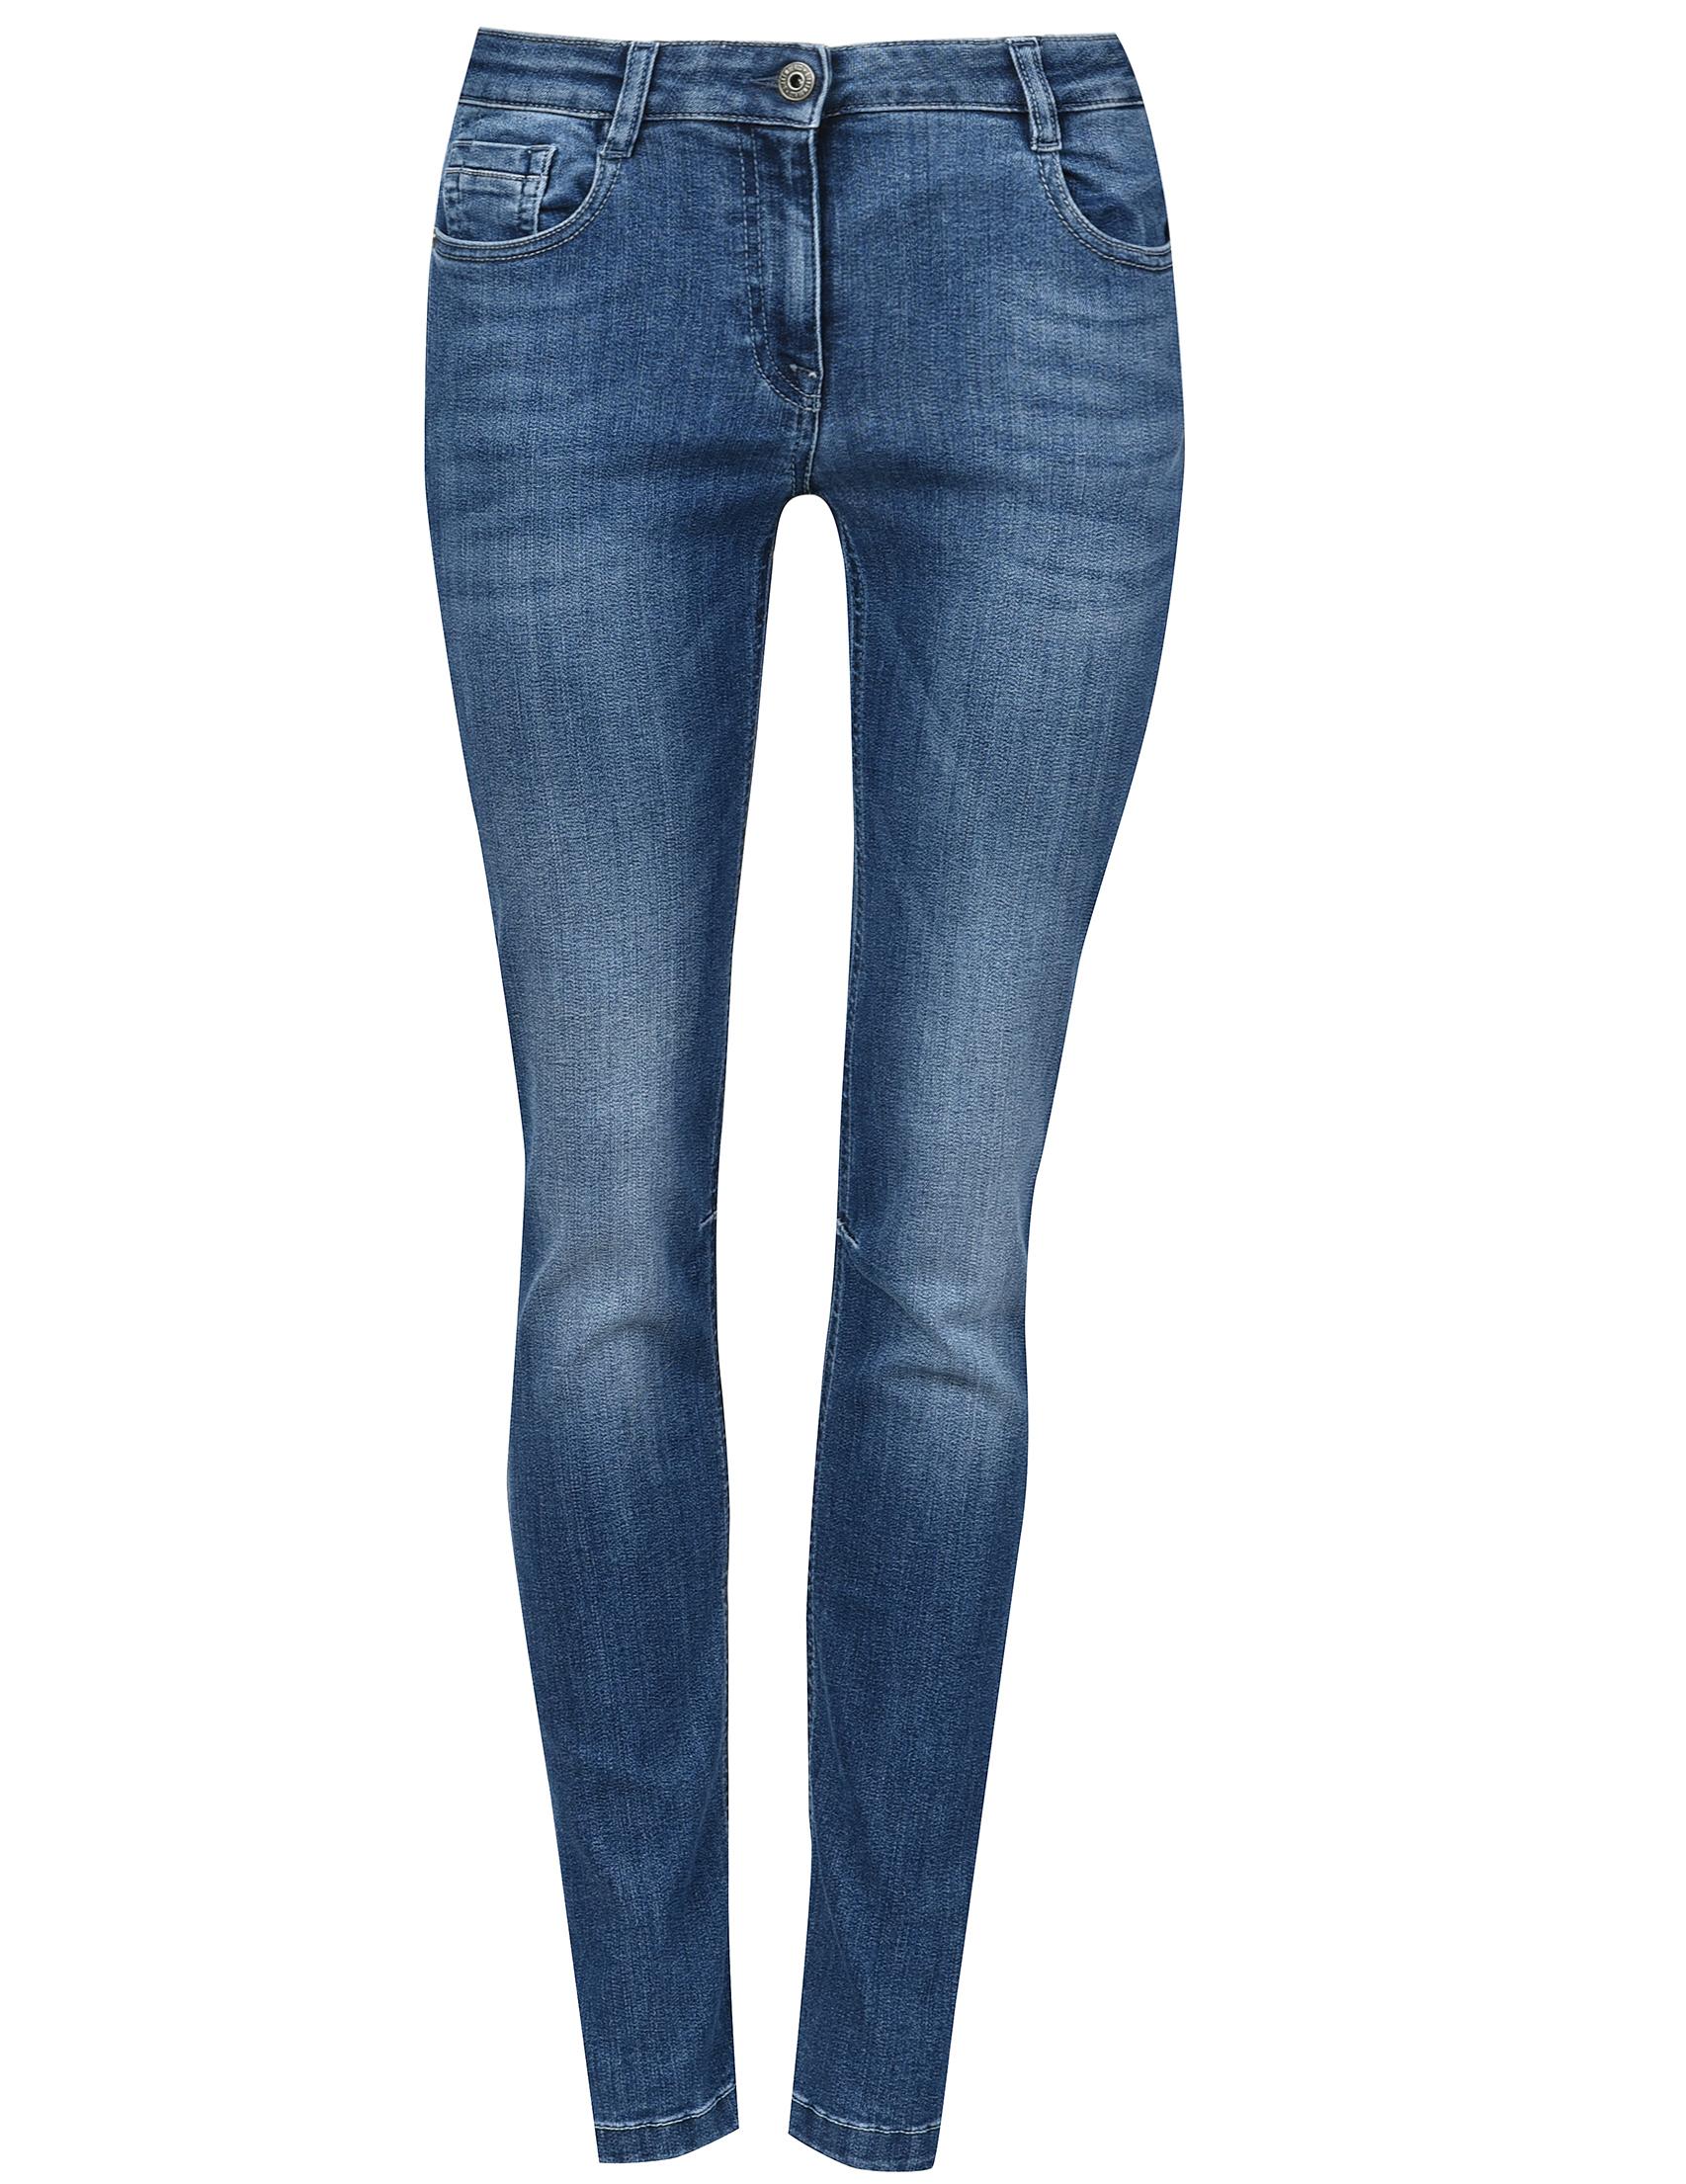 Женские джинсы BIKKEMBERGS 10100-061B_blue